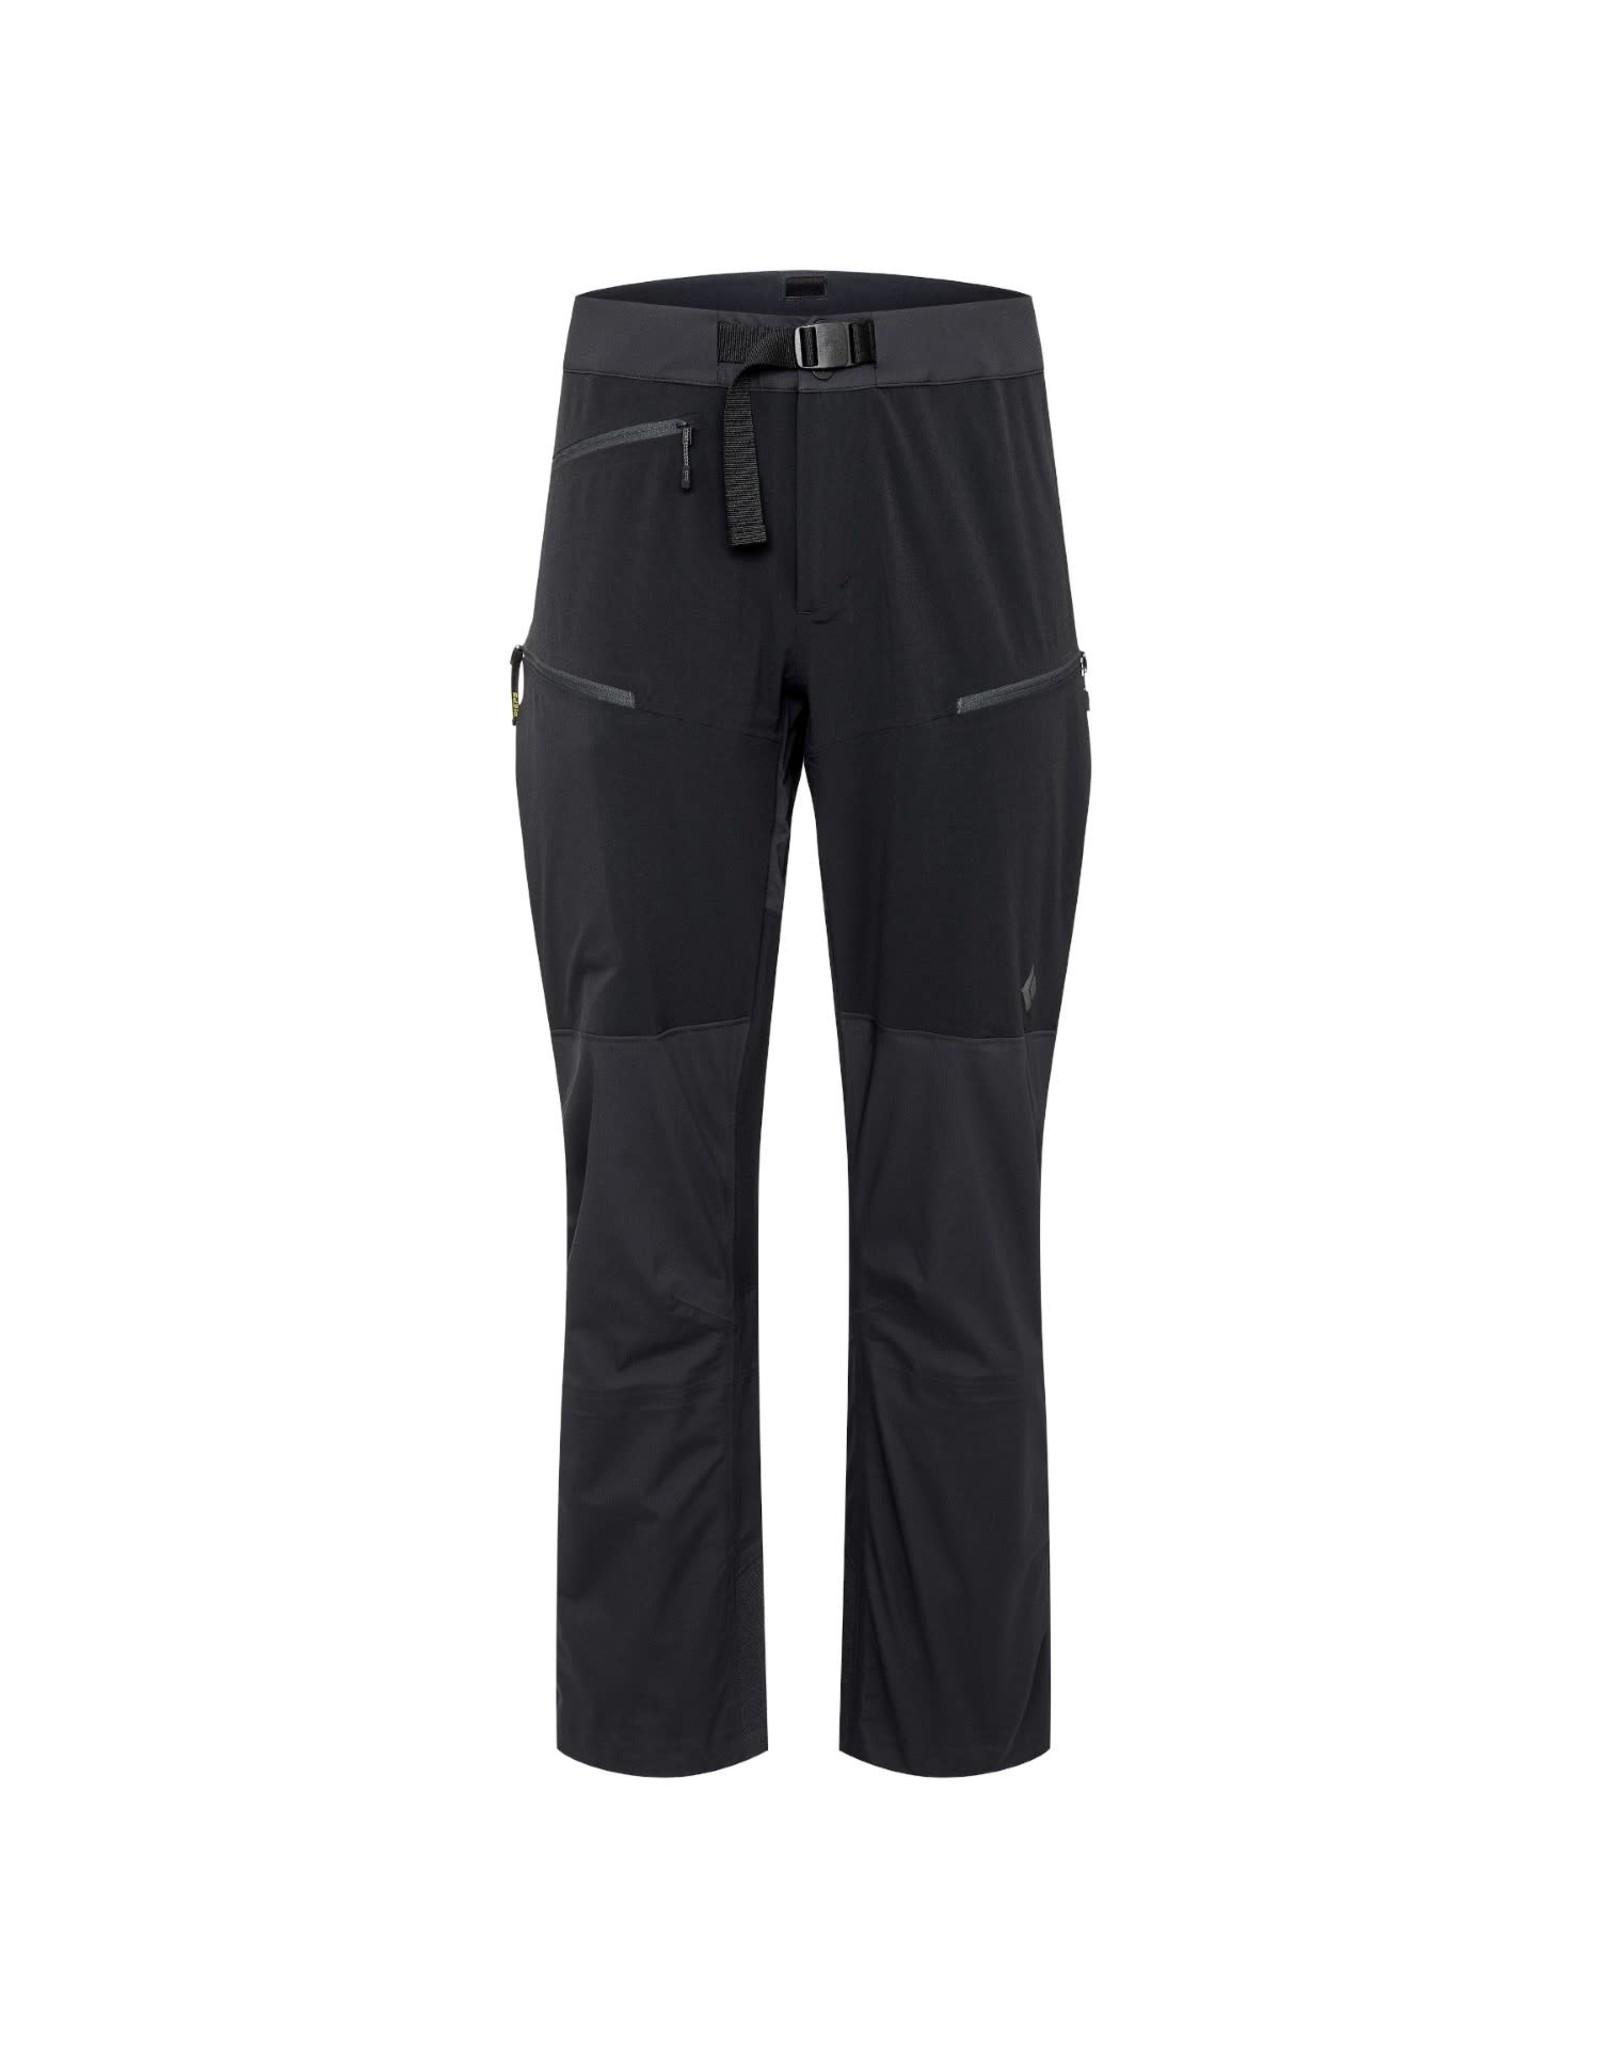 Black Diamond Pantalon Black Diamond Dawn Patrol Hybrid - Homme